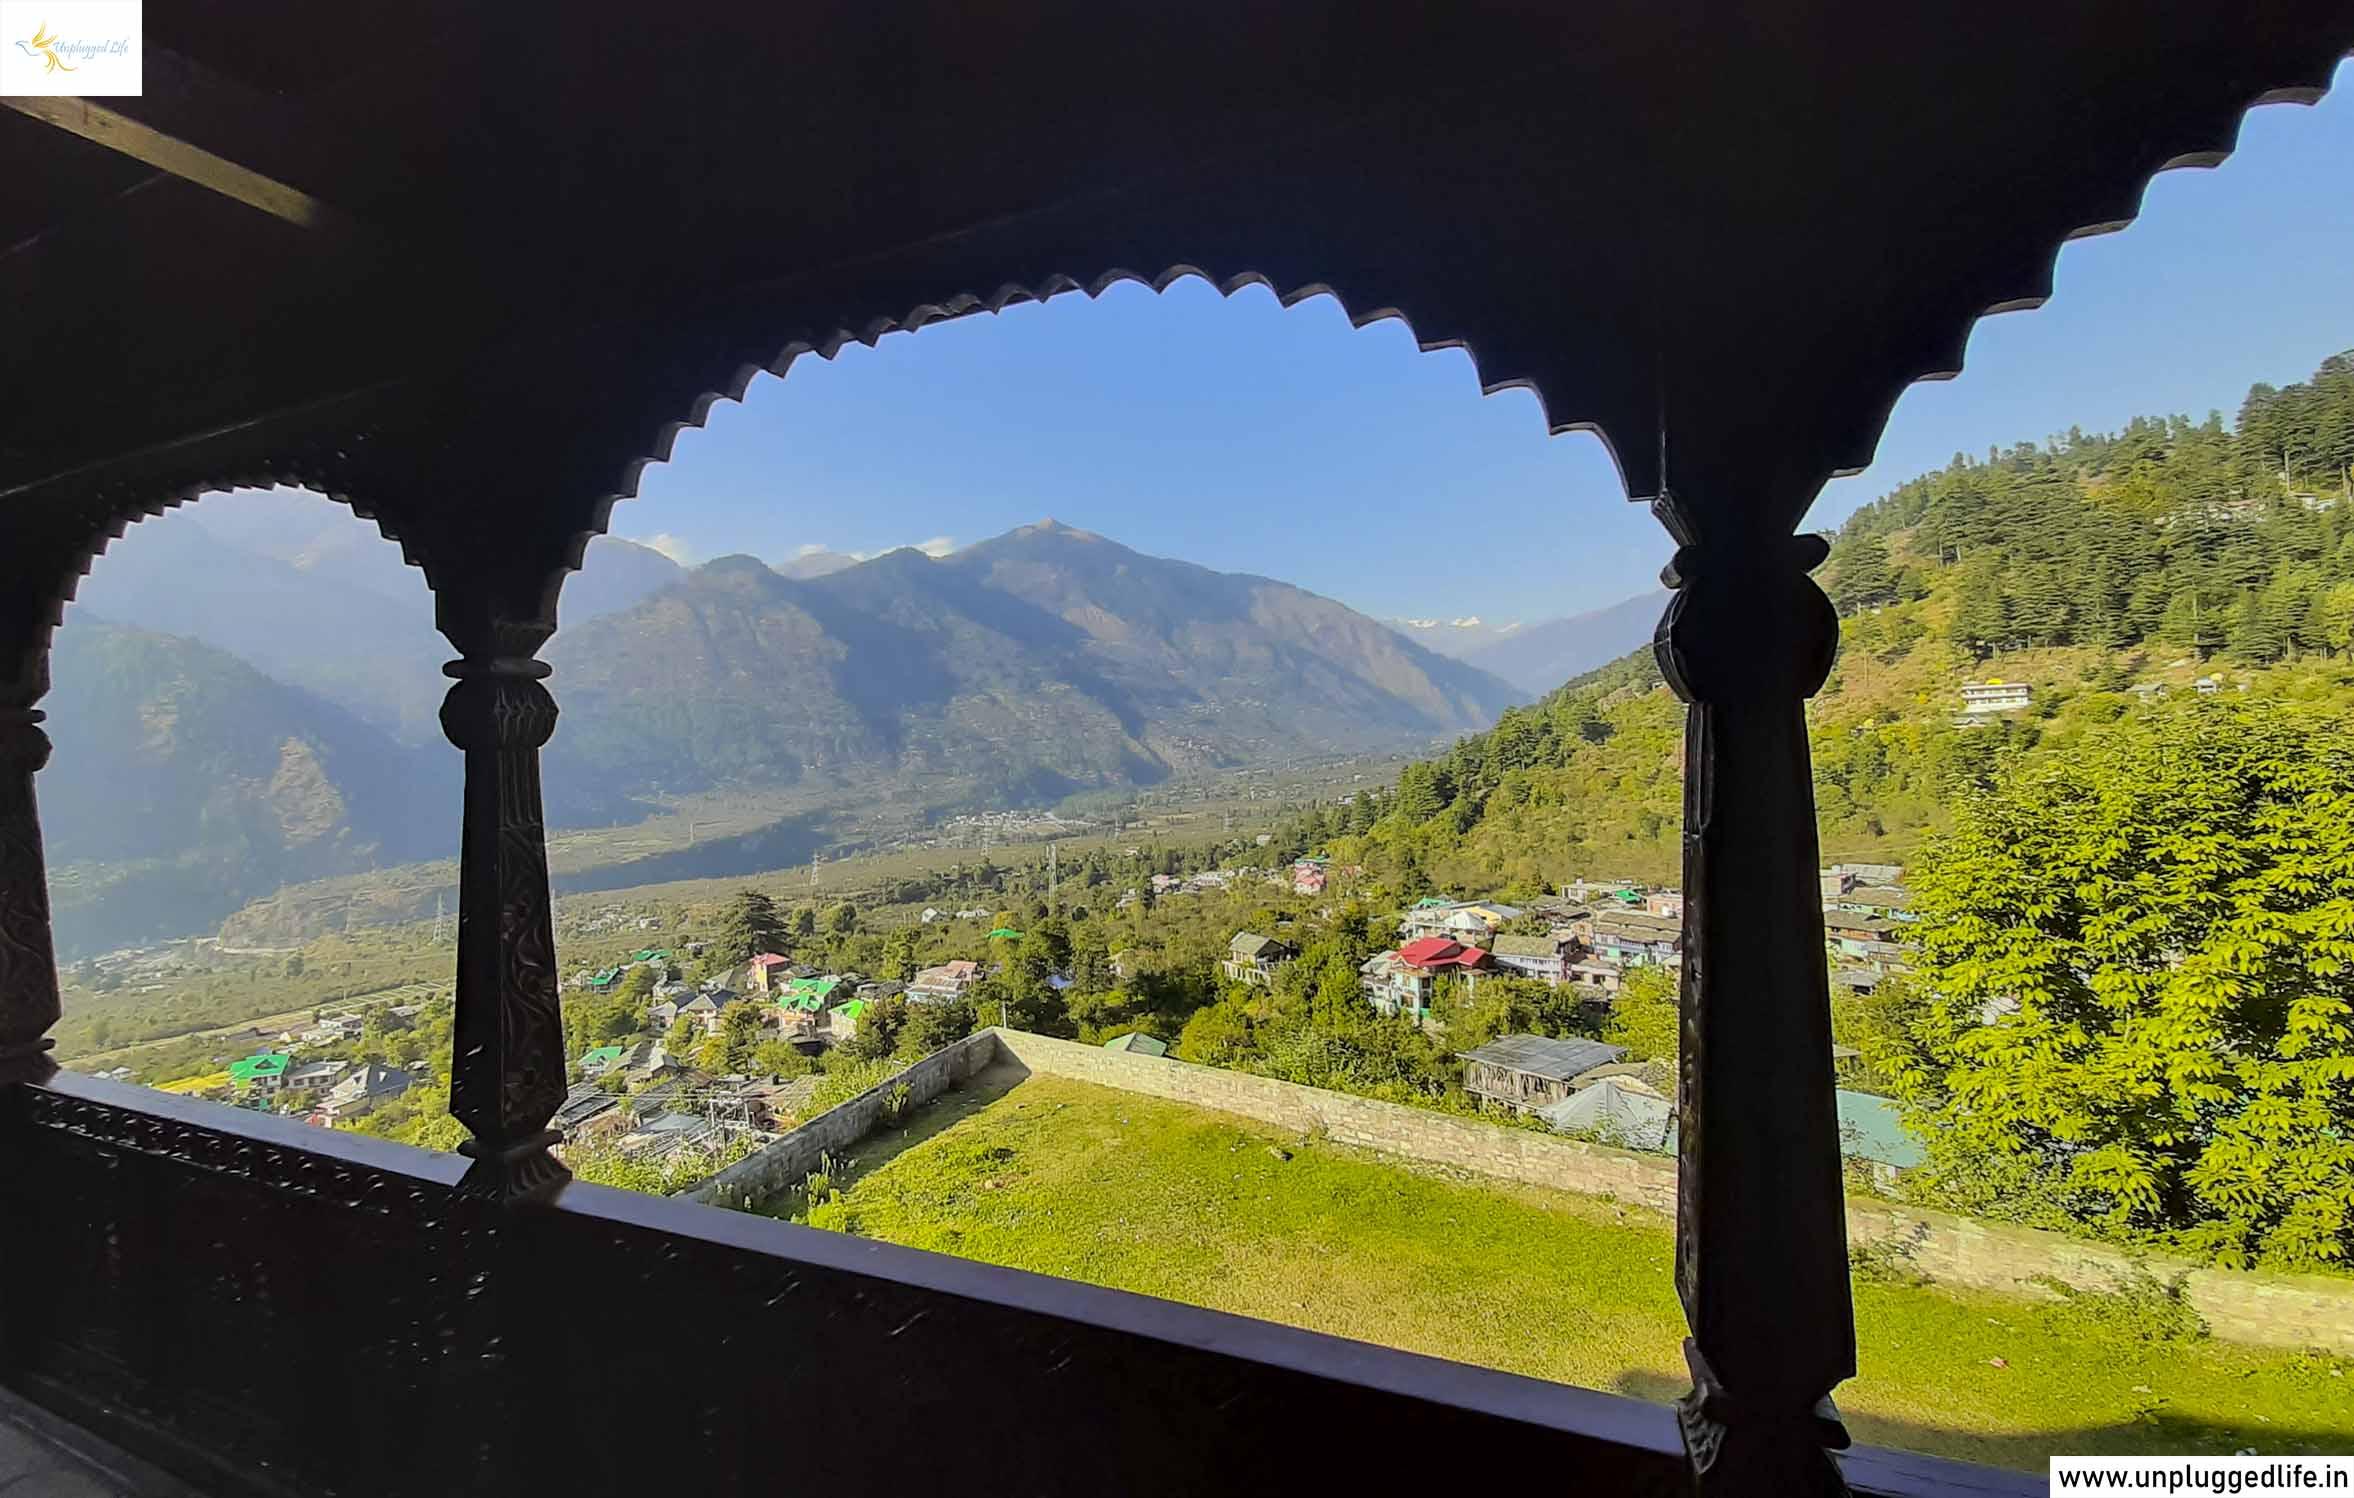 Unplugged Life, Naggar Castle, Manali, Himachal PRadesh, Himalayas, Valley view, Incredible India, Manali, Chandigarh to Manali, Manali to Leh Ladakh, Manali to Jispa, Himachal Pradesh, Himalayas, Manali to Keylong, Manali to Sarchu, Jispa to Sarchu, Keylong to Sarchu, Manali to Rohtang Pass, Chandigarh to Leh Ladakh, Ladakh by Road, Ladakh Overland, Drive to Leh Ladakh, Leh Ladakh Tour Package, Ladakh Tour, Mountain View, View of Himalaya, Old Manali